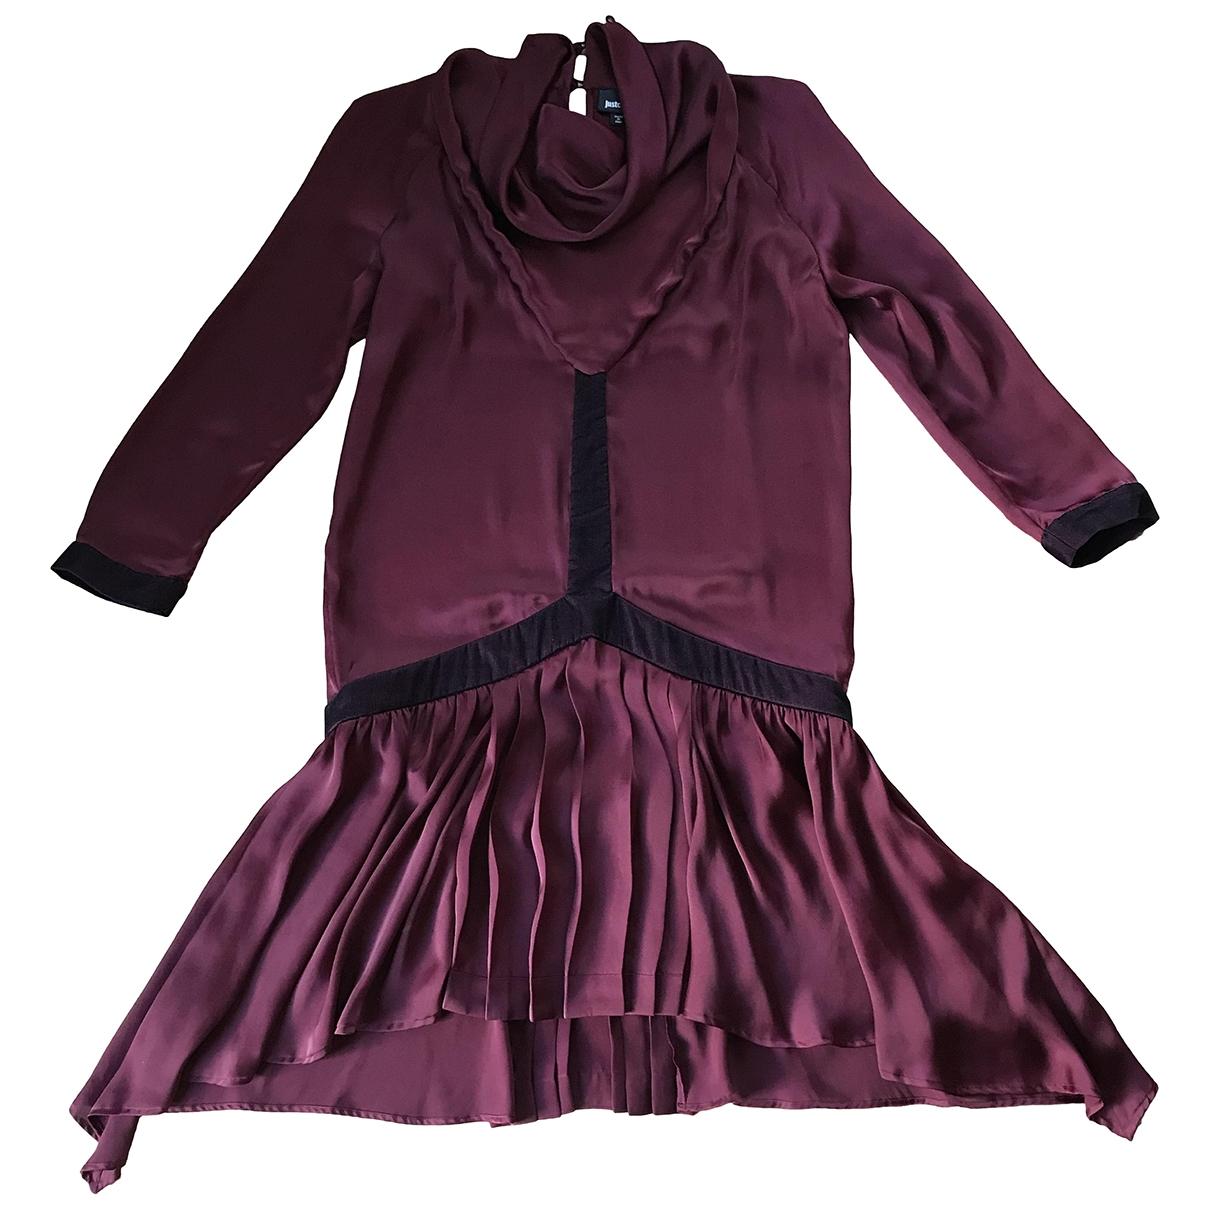 Just Cavalli \N Kleid in  Bordeauxrot Polyester